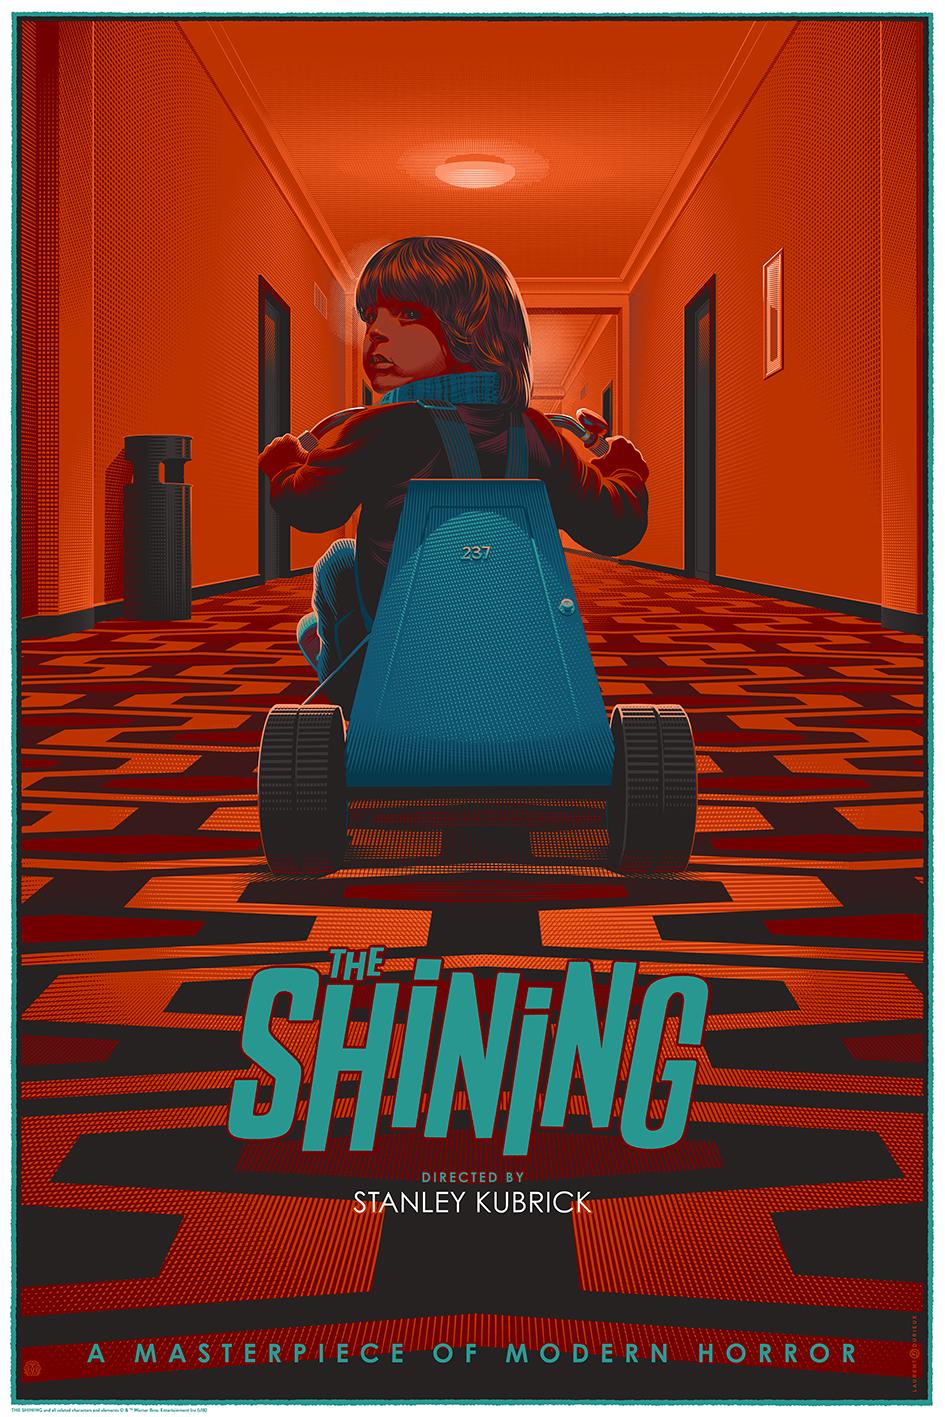 The+Shining%231-HALLWAY.jpg?format=1000w